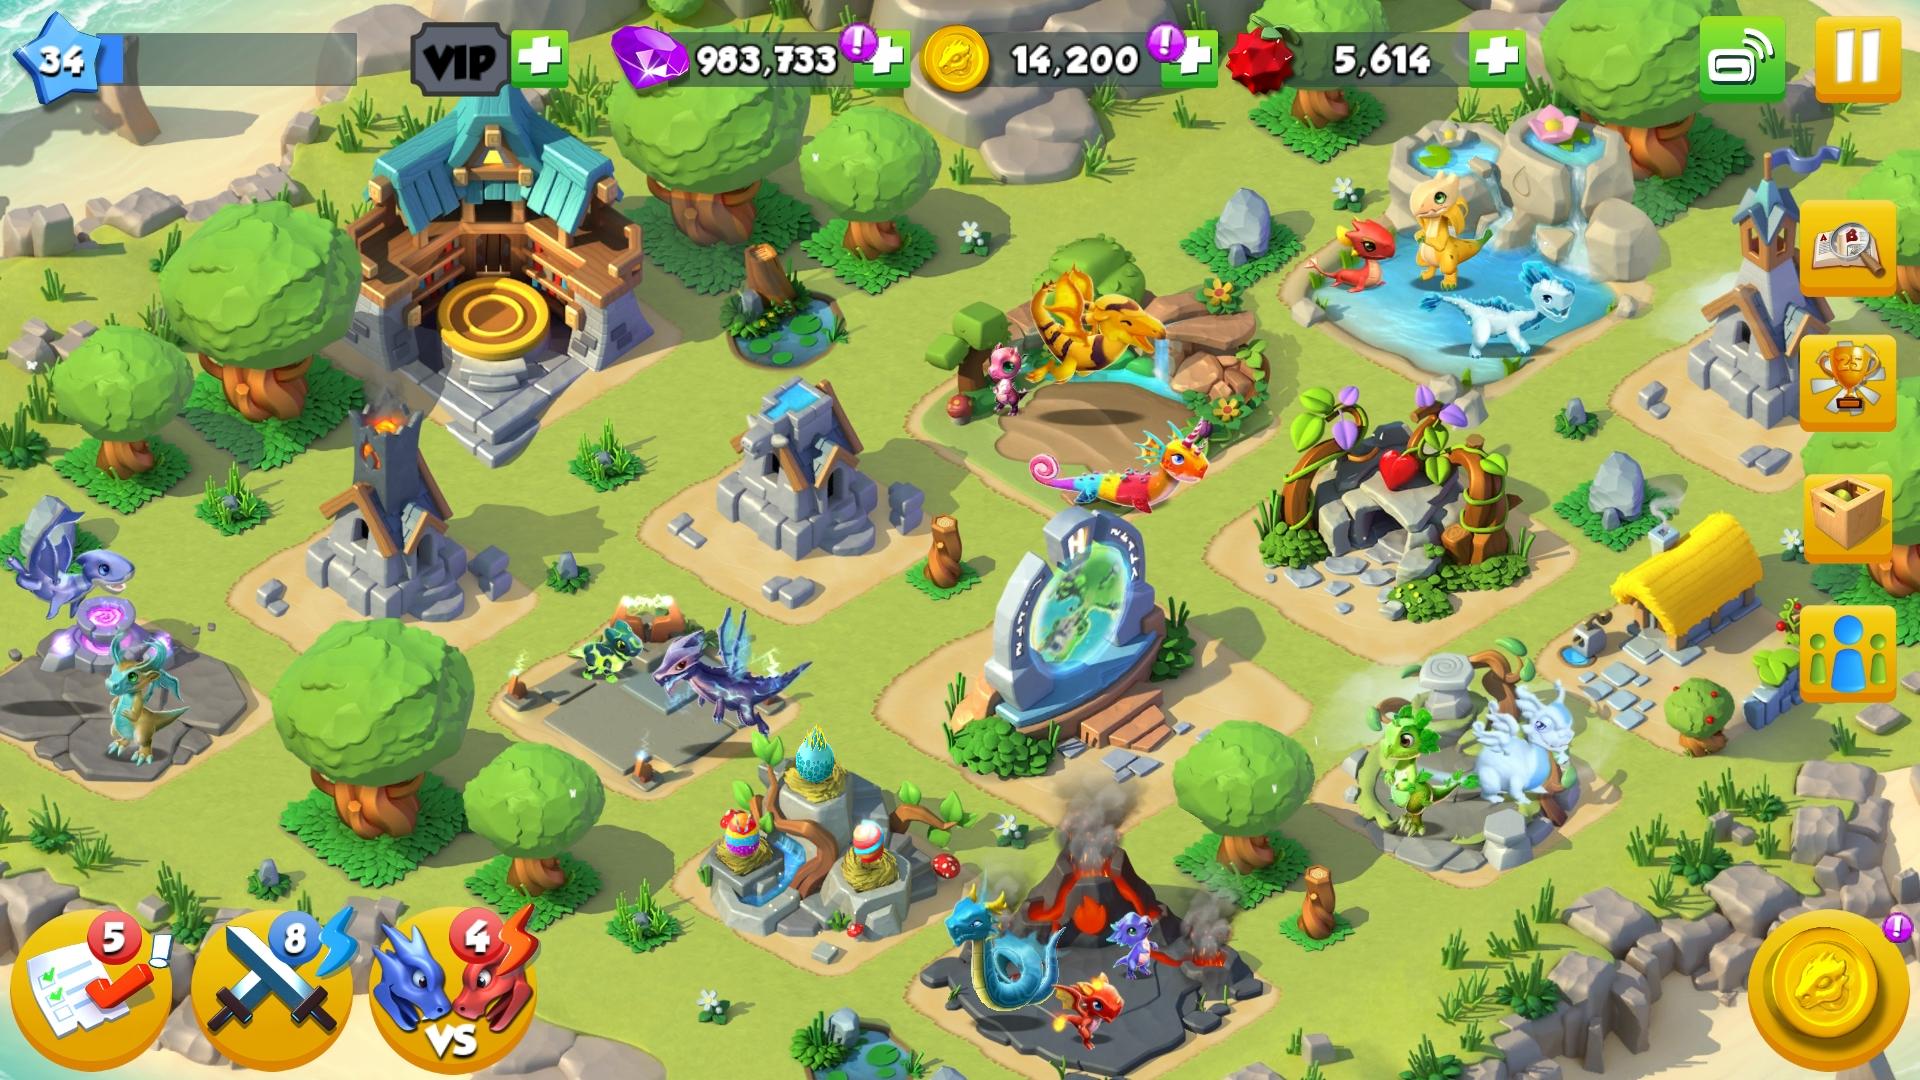 Dragon Mania Legends for iOS iPhone screenshot 002 | WISH I